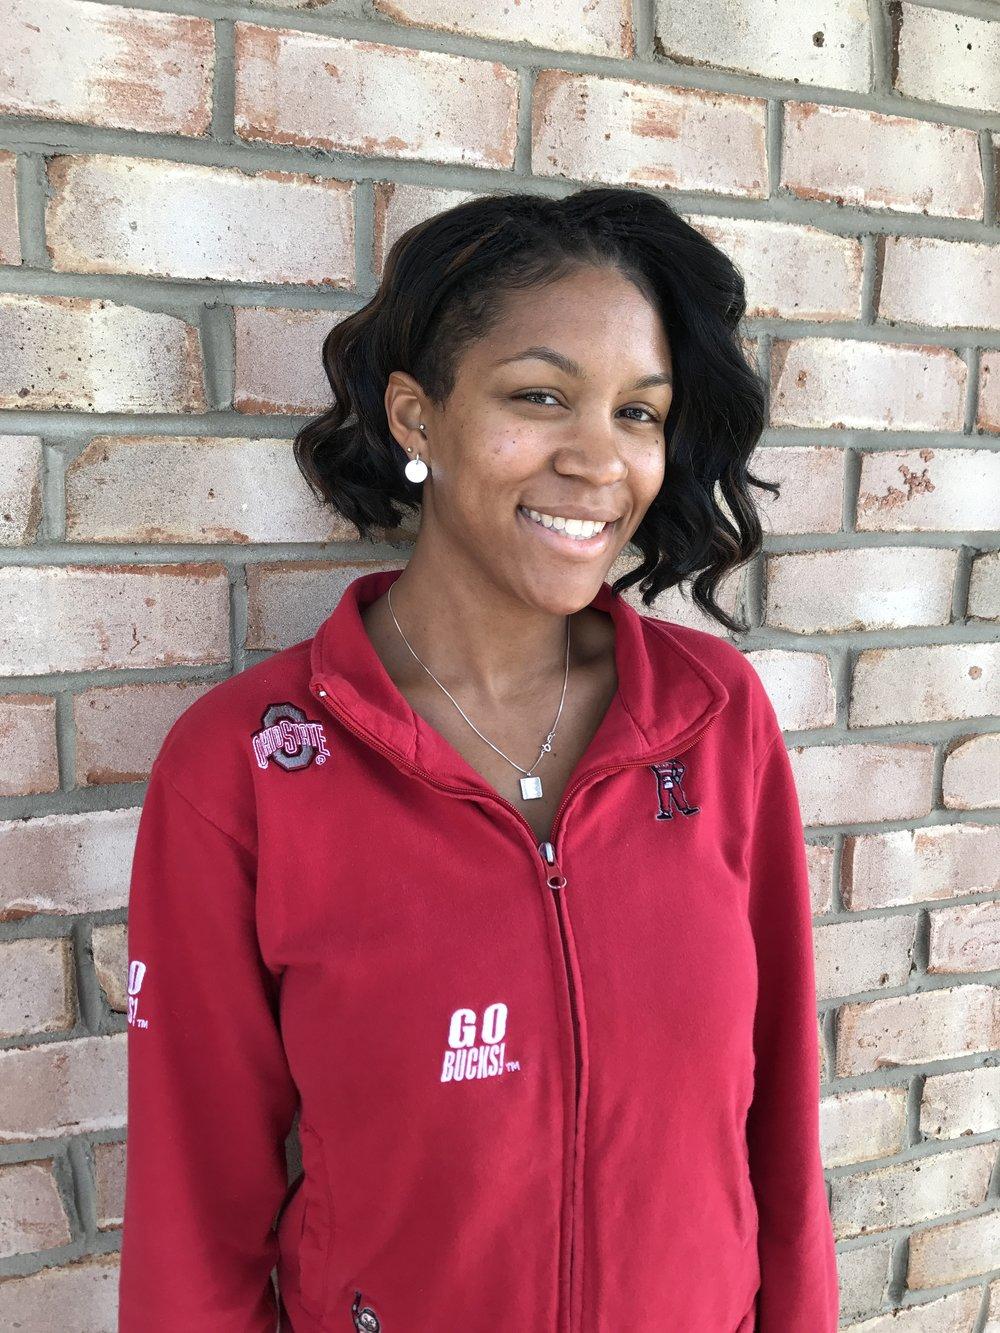 Latrice Everett The Ohio State University